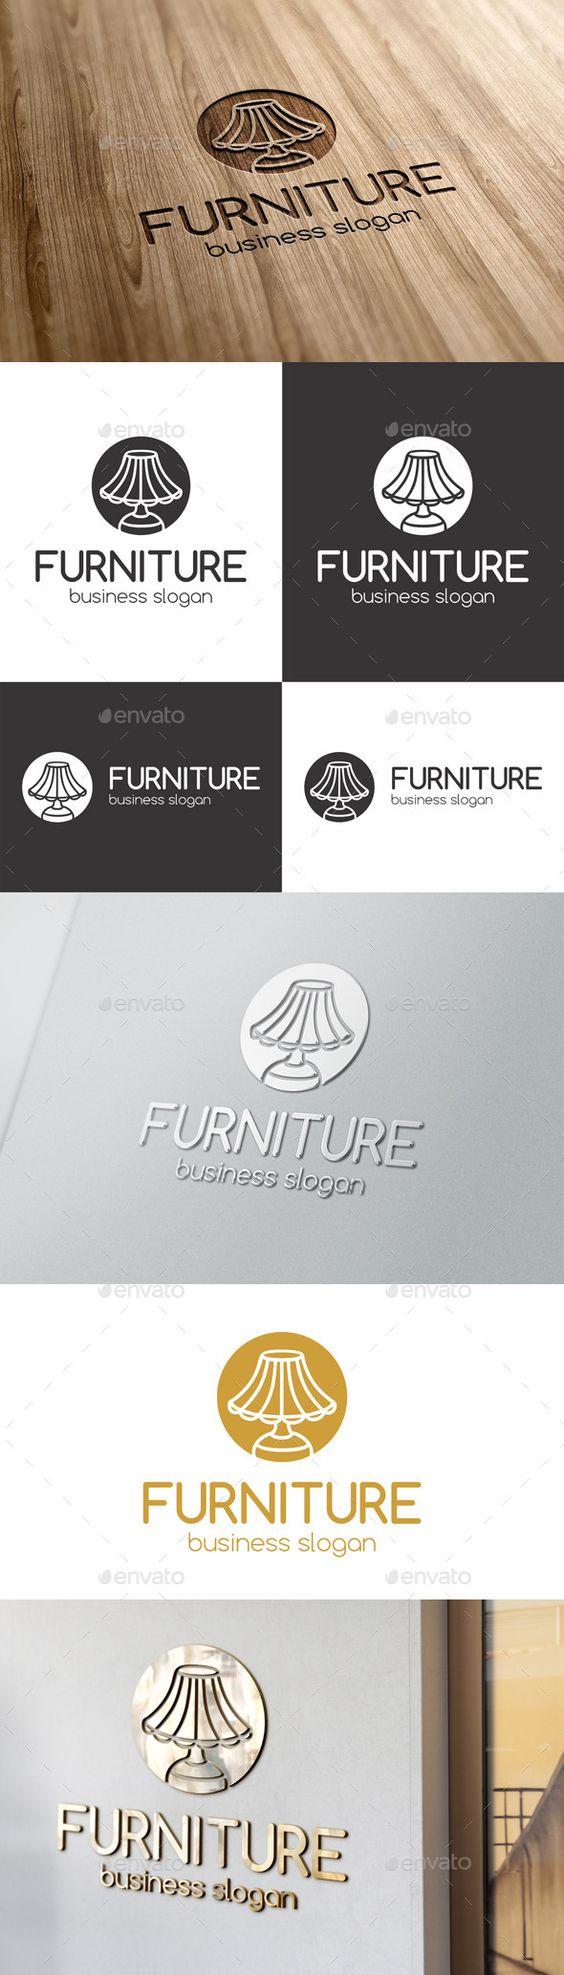 Furniture Logo Desk Lamp – Desk Lamp Logo